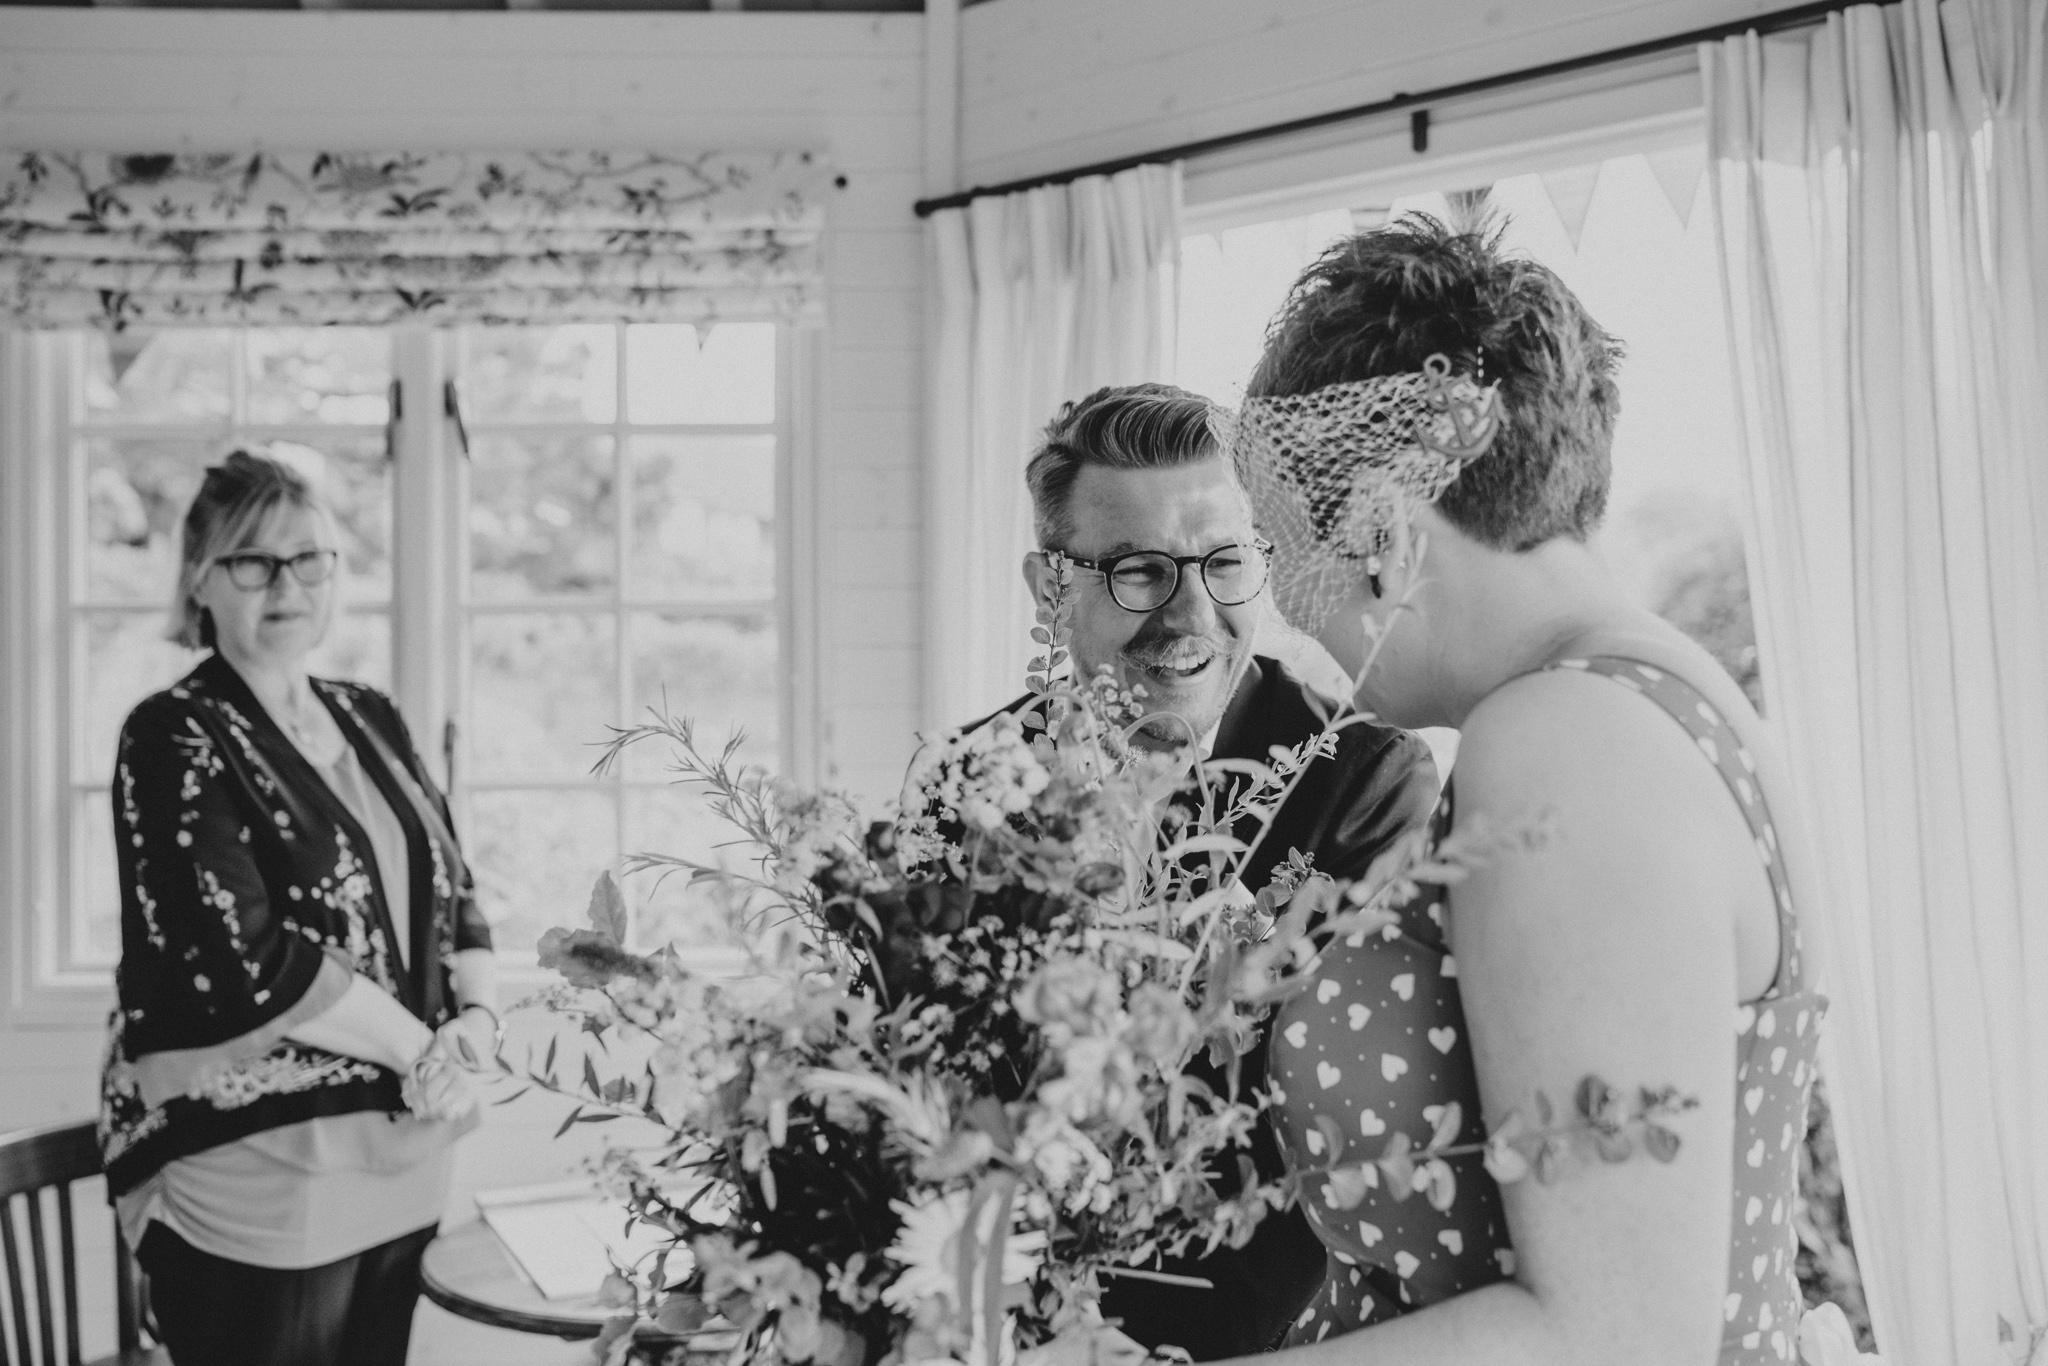 hannah-anthony-thorpeness-retro-diy-50s-wedding-grace-elizabeth-colchester-essex-alternative-wedding-lifestyle-photographer-essex-suffolk-norfolk-devon (11 of 39).jpg